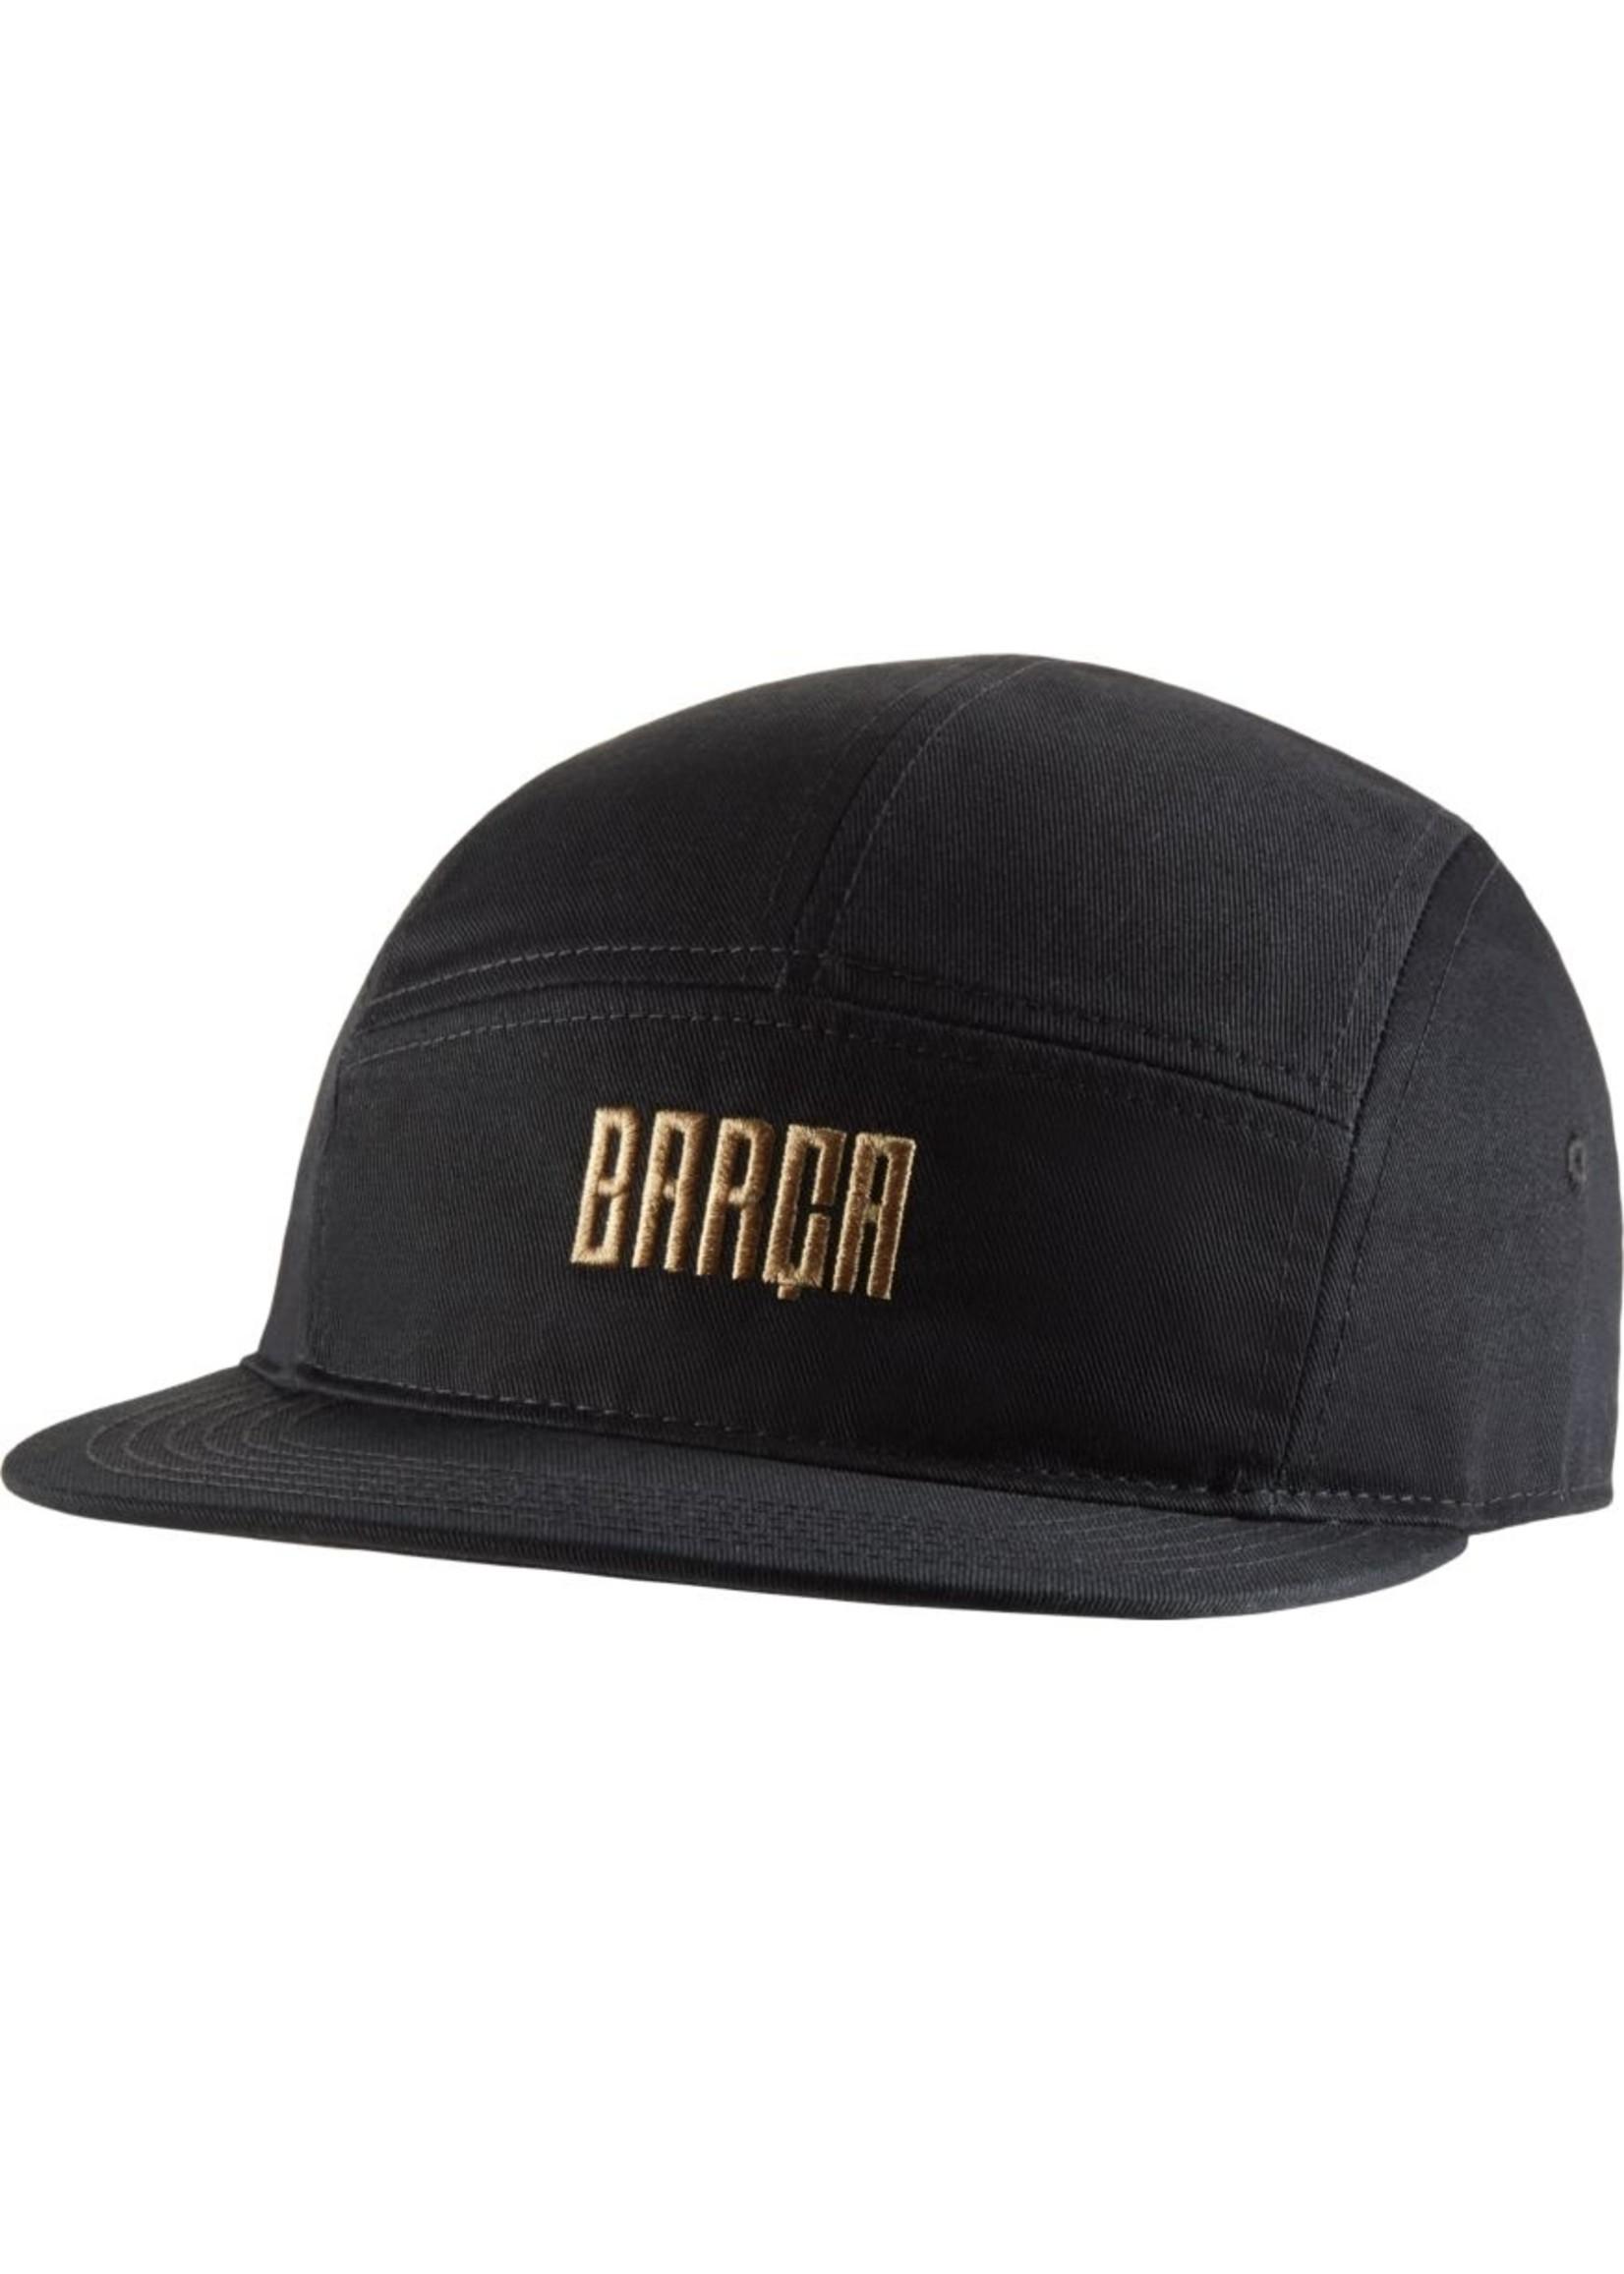 Nike Barcelona Cap - Black/Gold